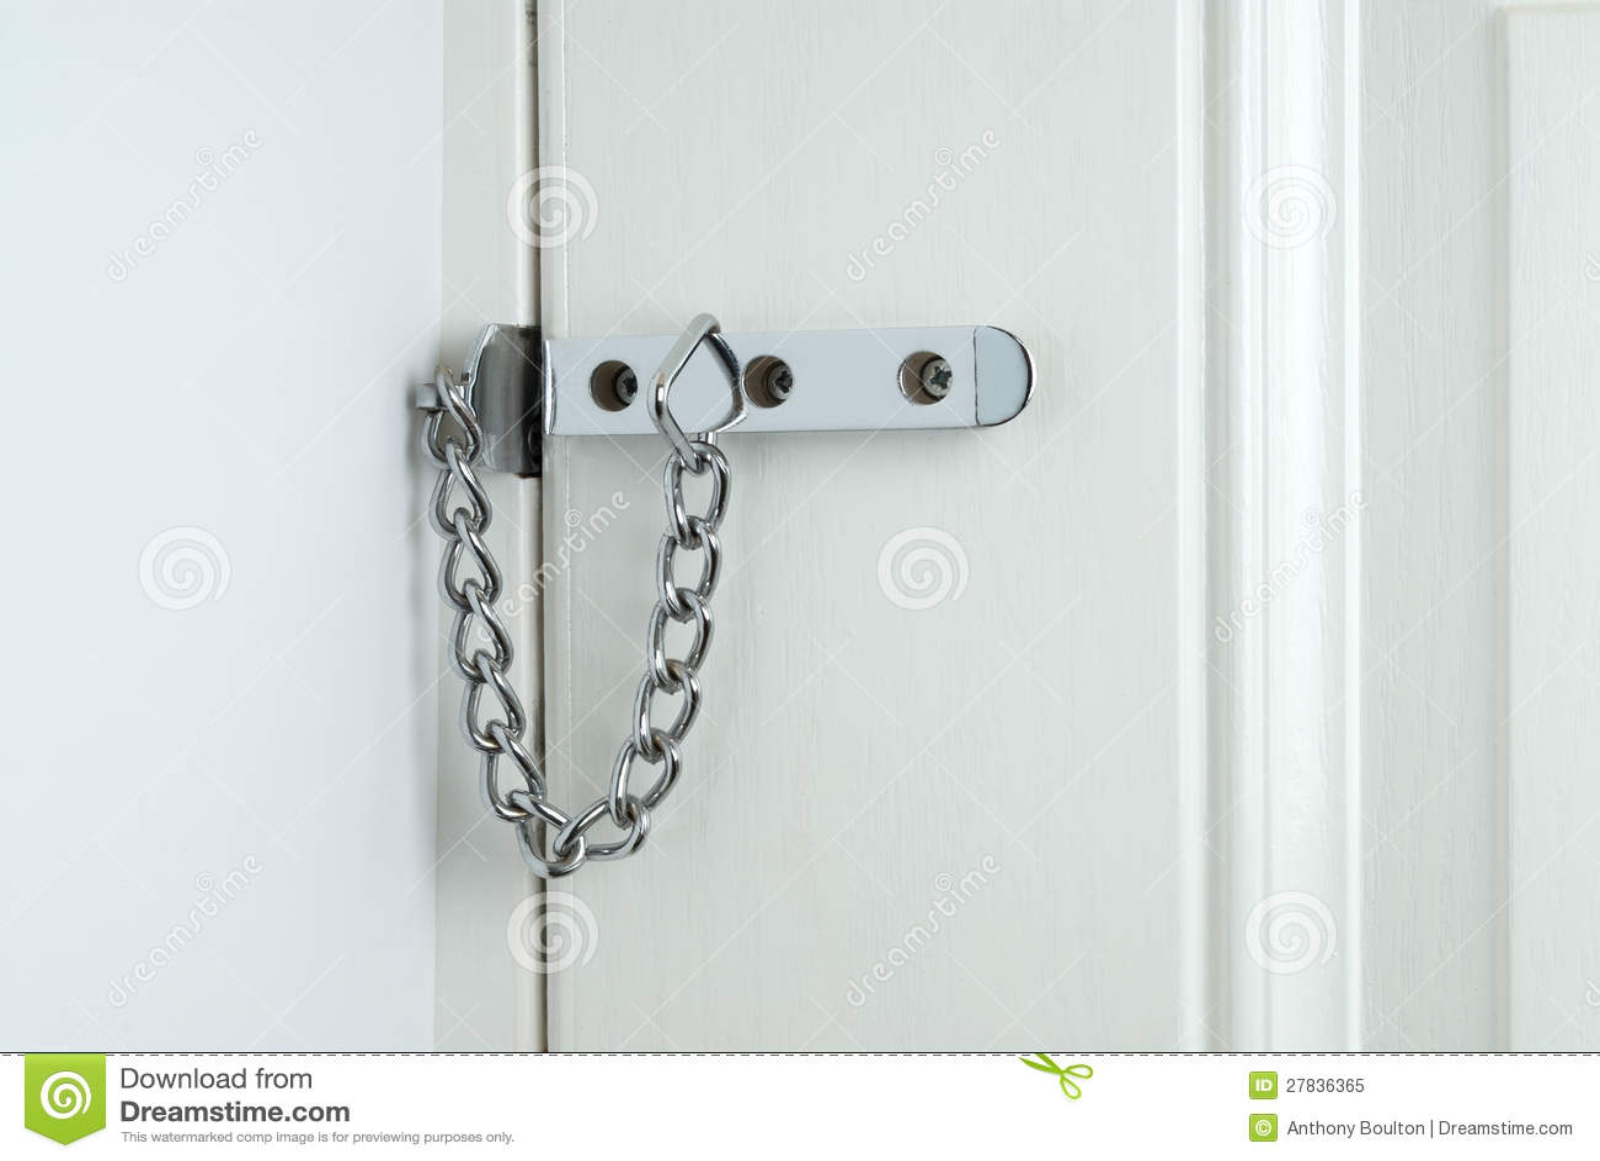 Door security chain stock image. Image of anti, theft - 27836365